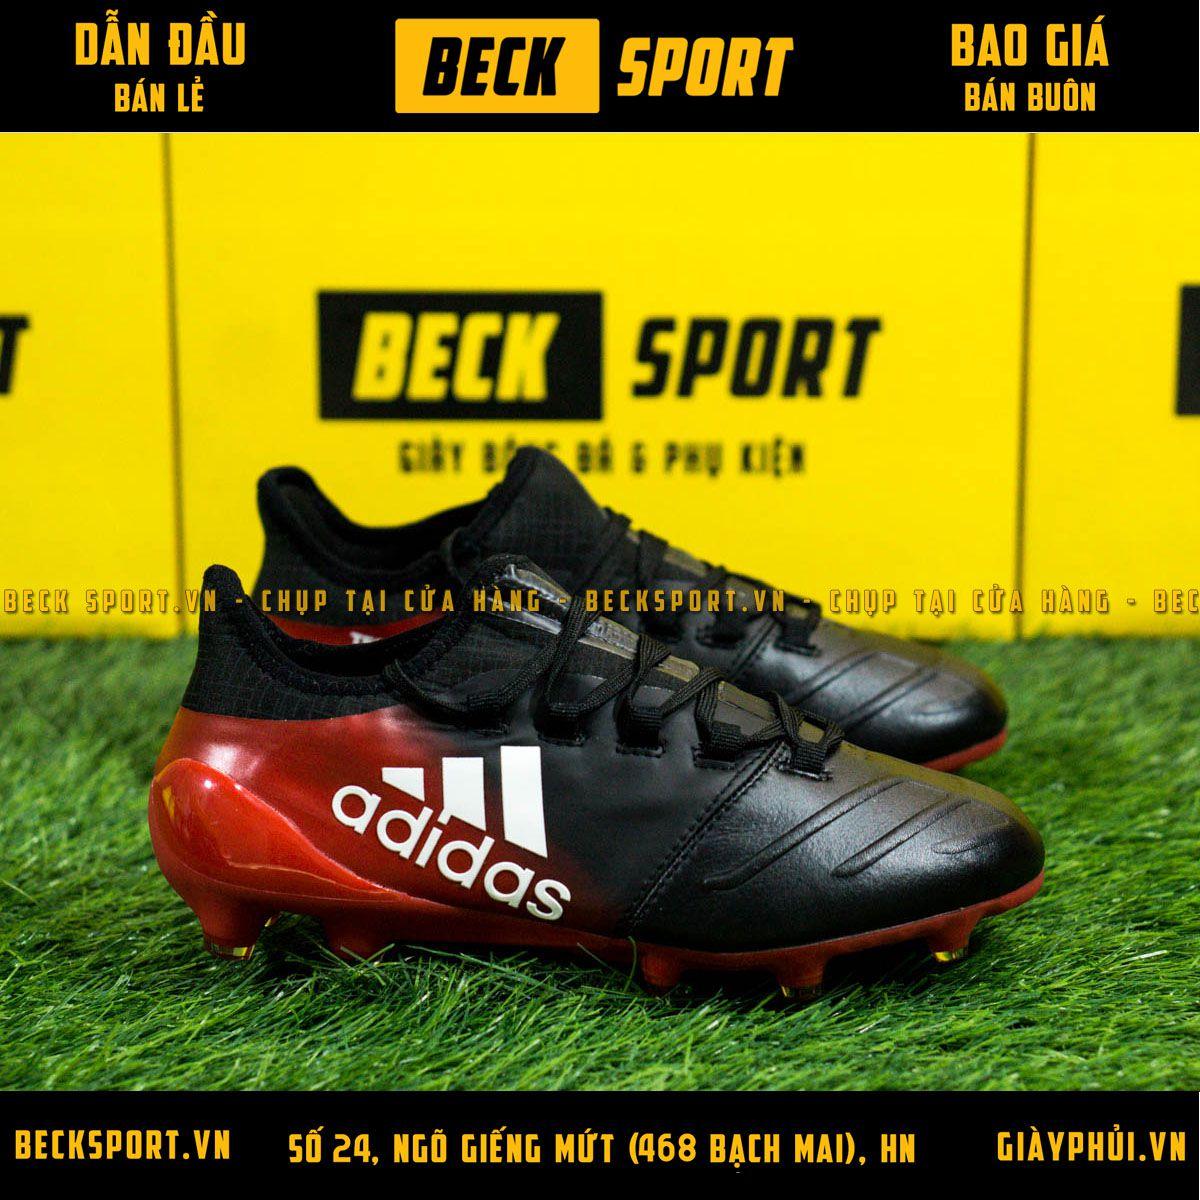 Giày Bóng Đá Adidas X 17.3 Đen Gót Đỏ FG